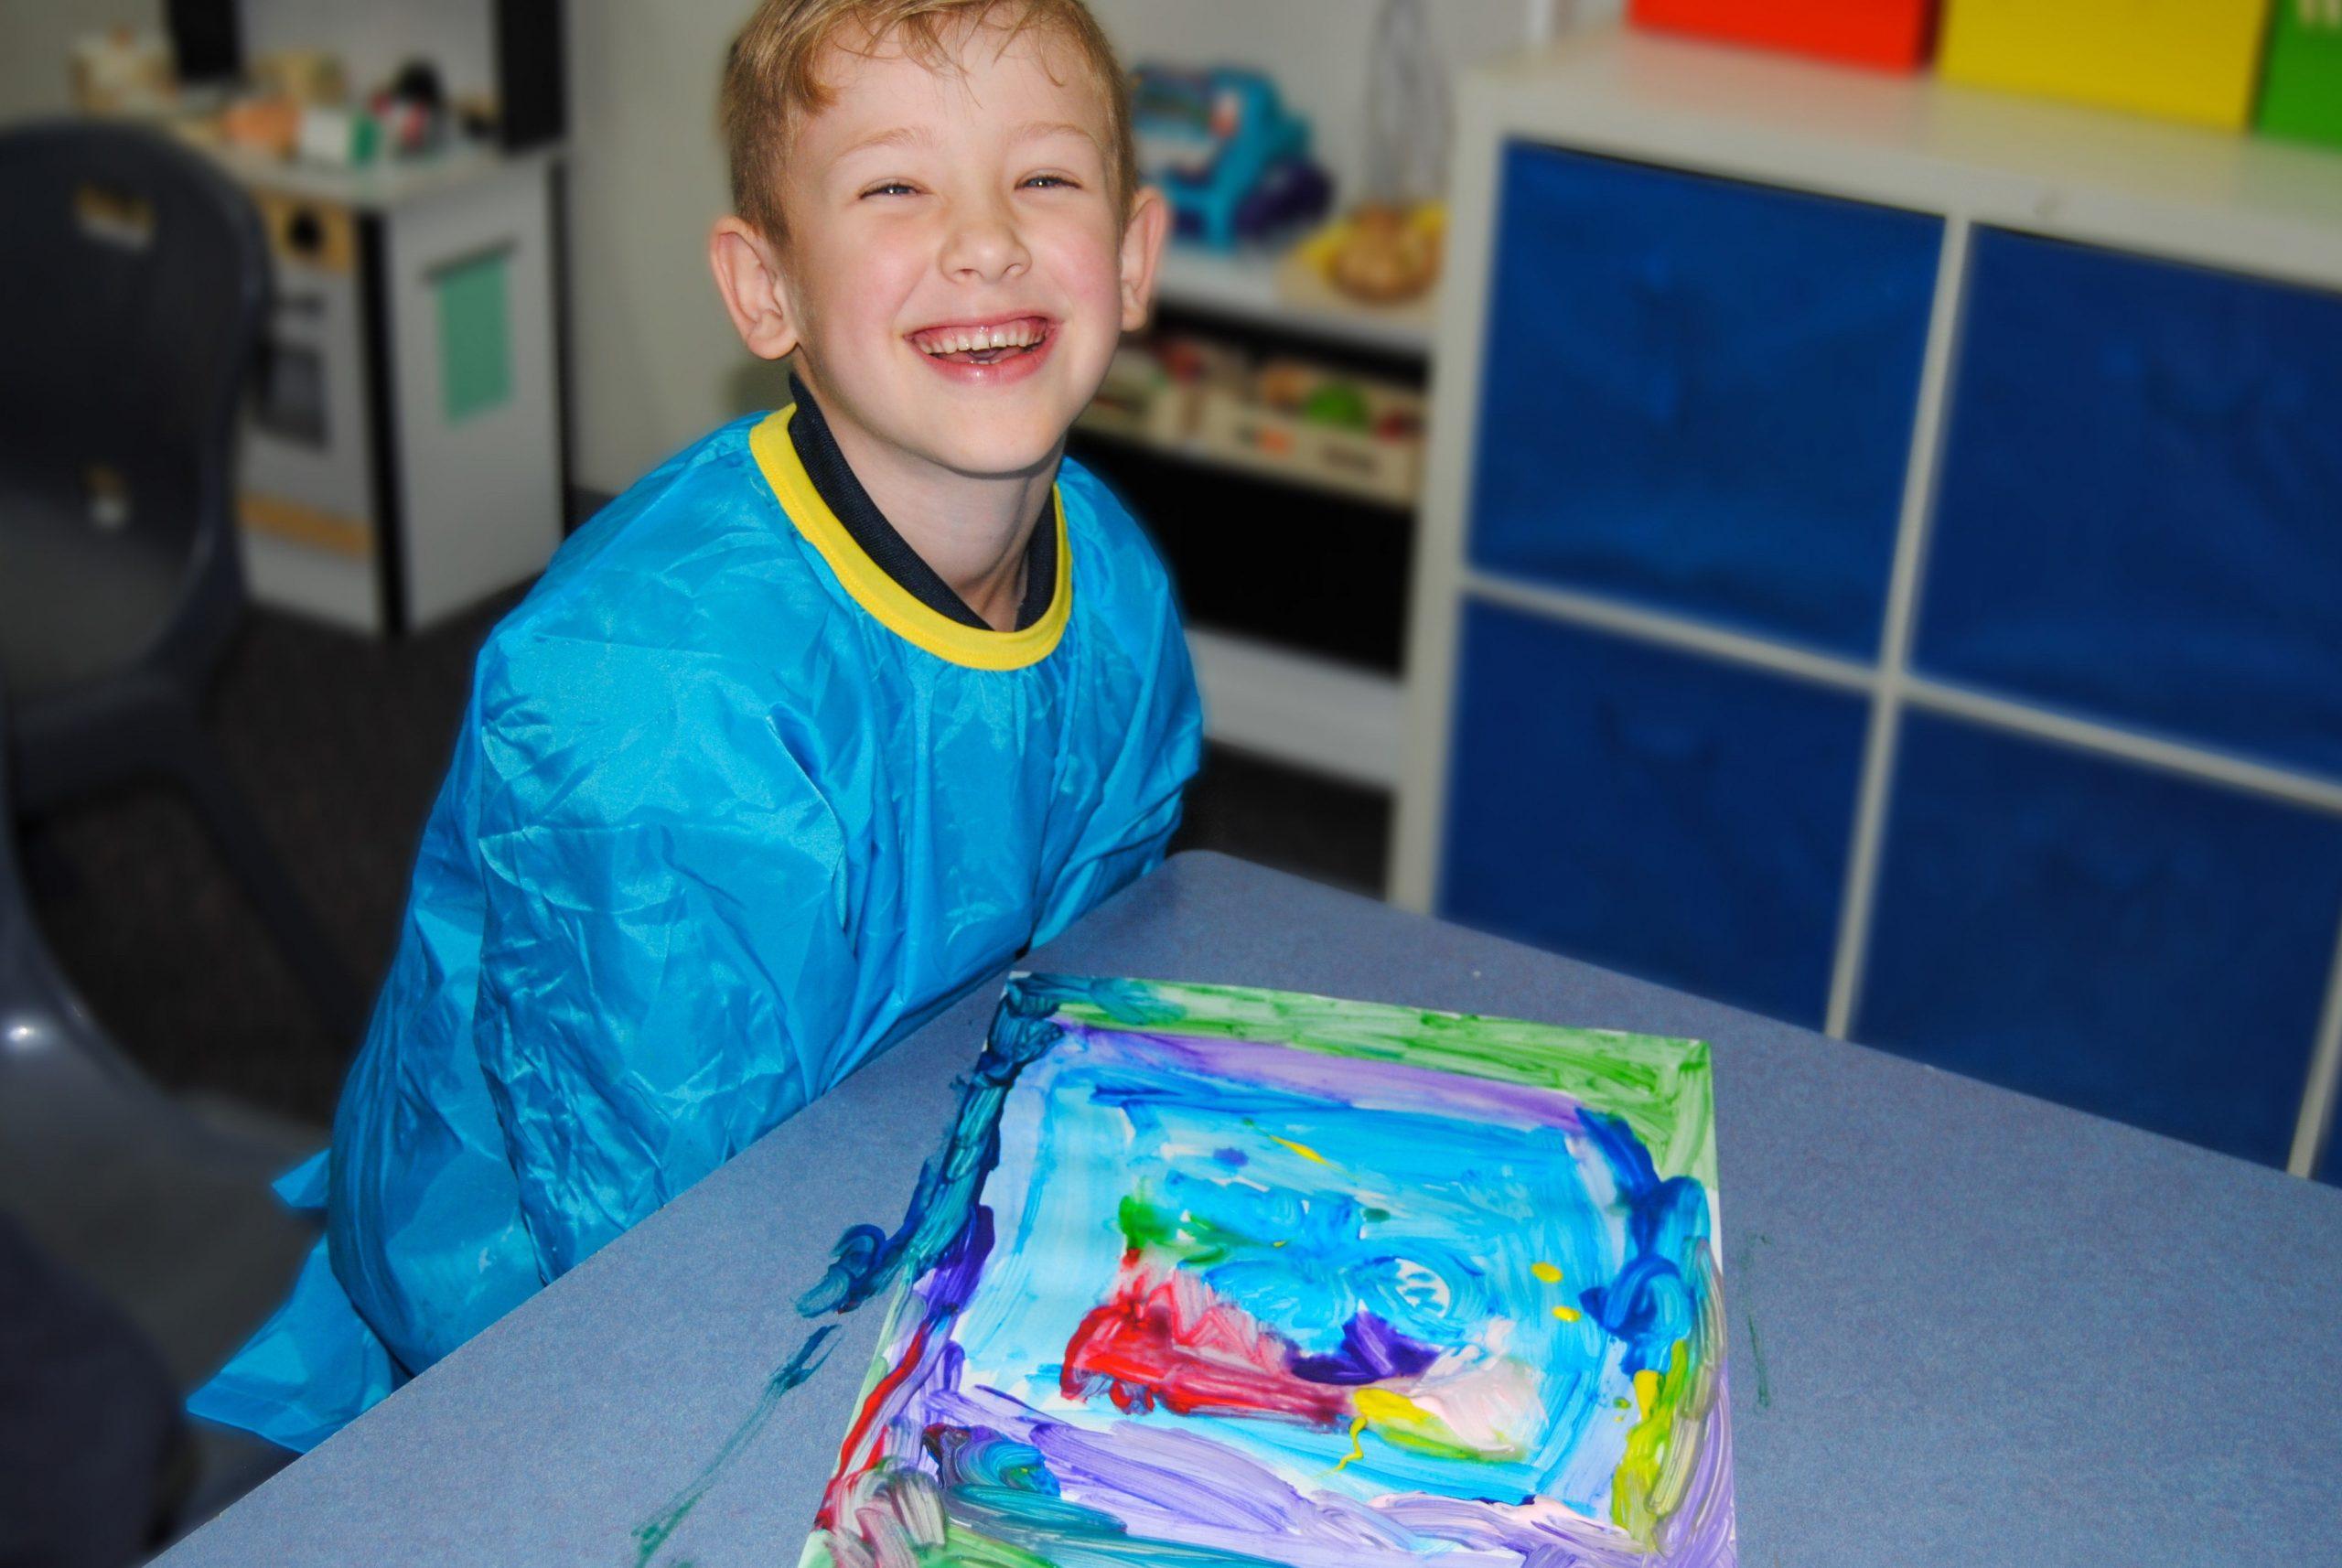 Pakenham Hills Primary School - Mission Statement and Community Values